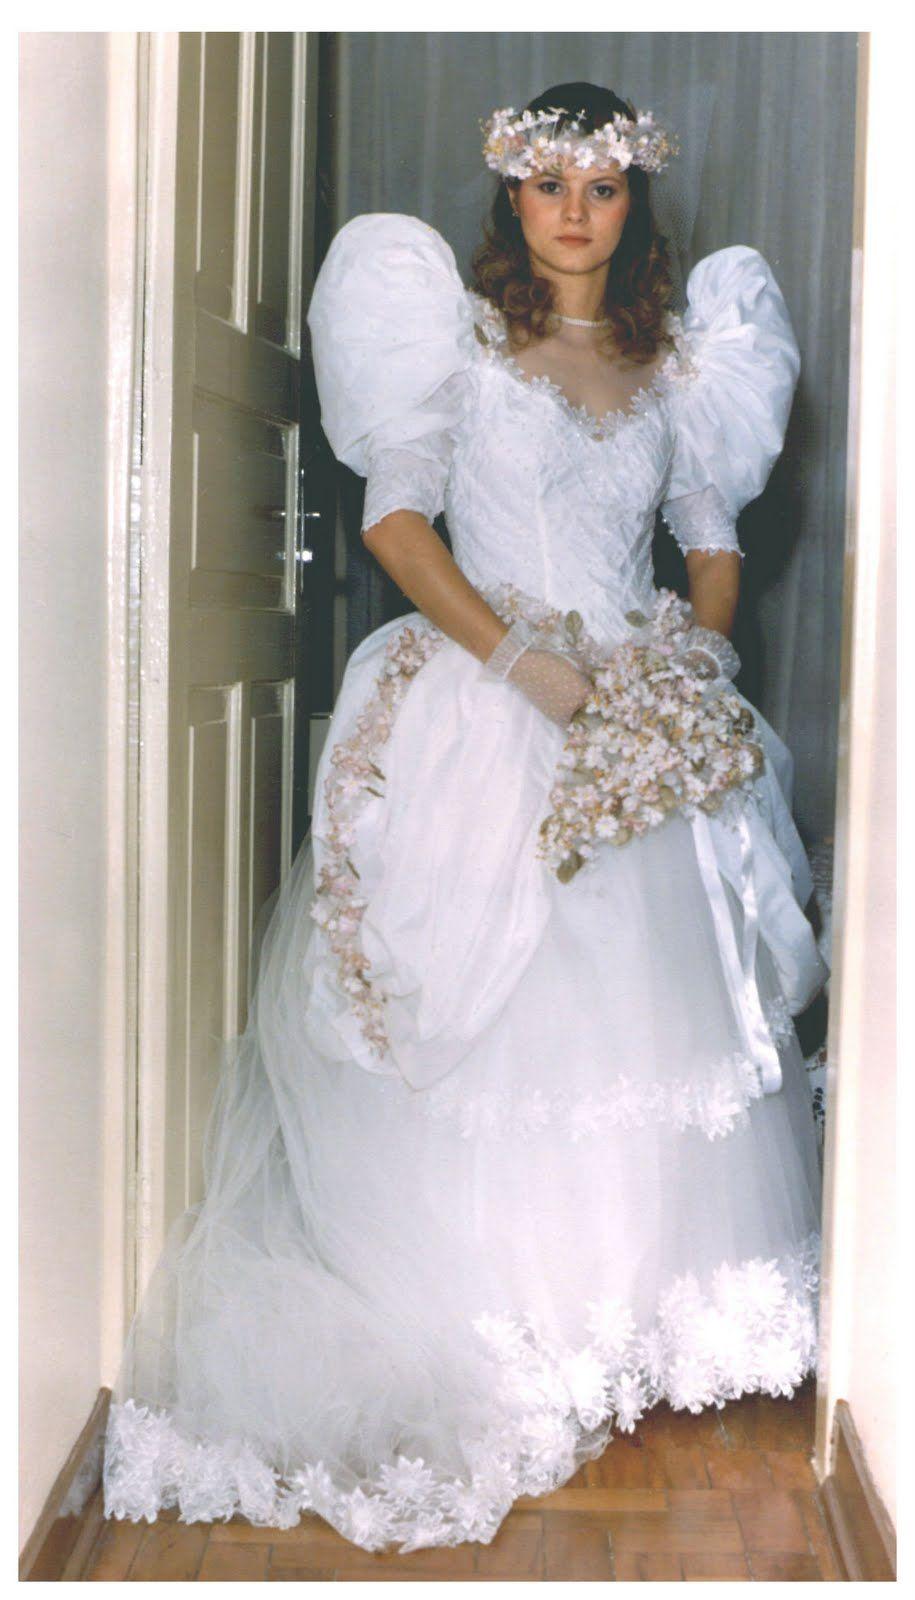 Pin by estella scallony on trajes de novia de pinterest